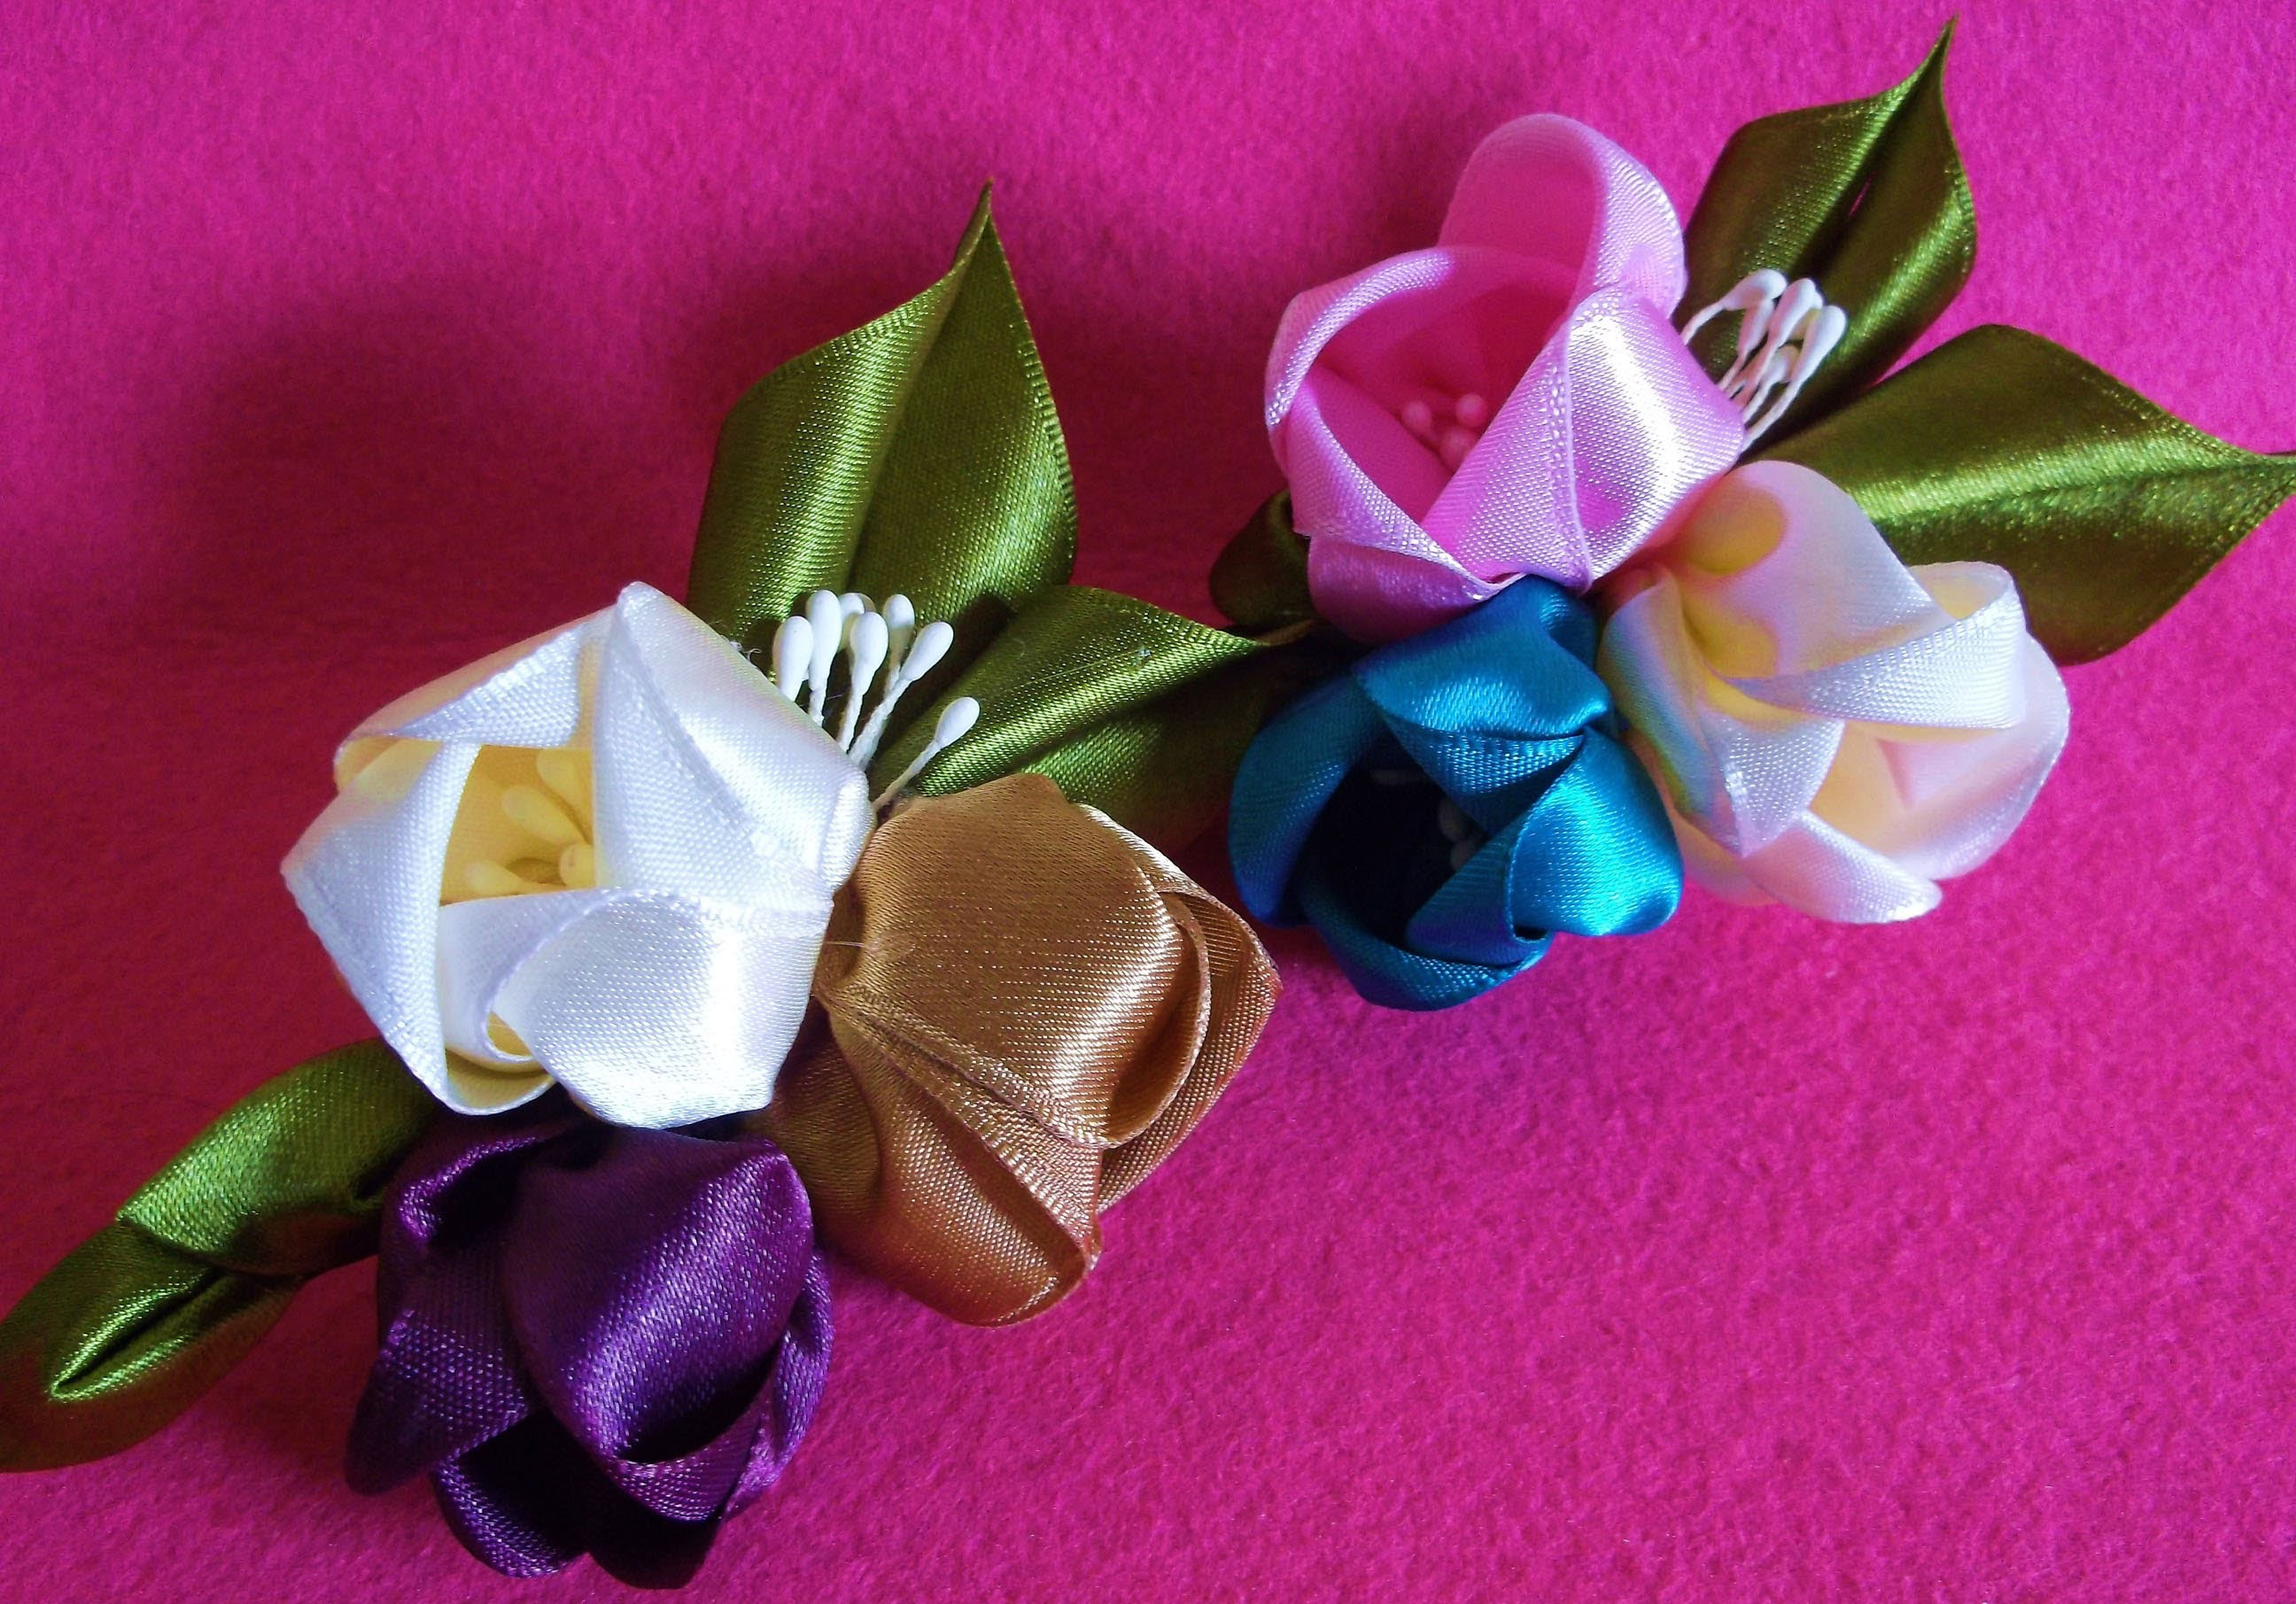 D.I.Y. Kanzashi inspired Satin Tulip Flower Hair Clips - Tutorial